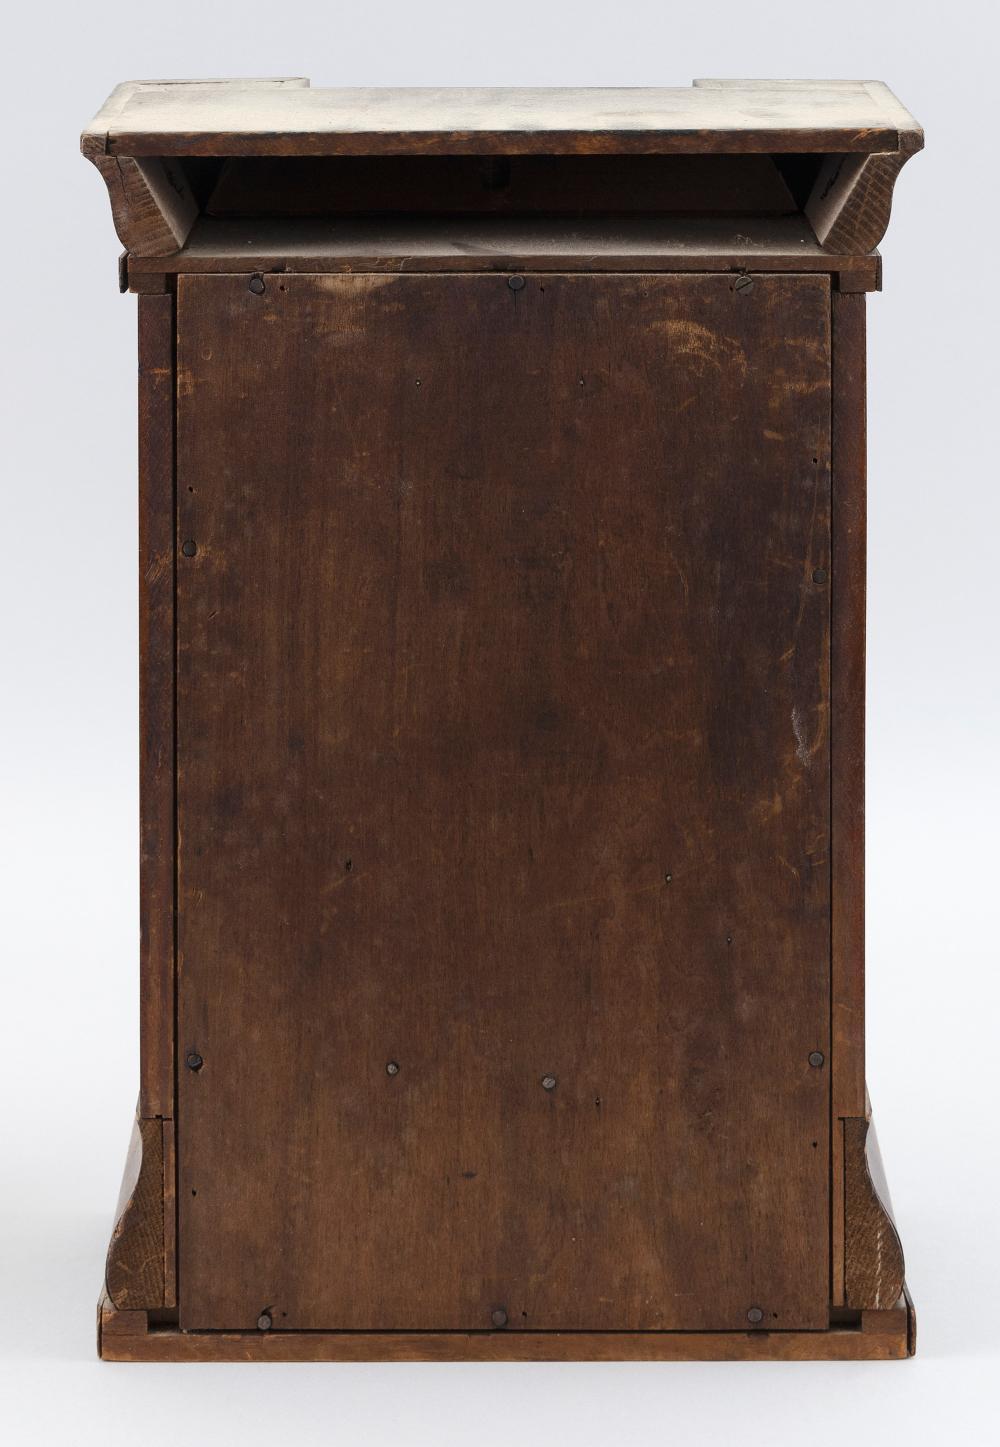 SETH THOMAS HALF-SIZE PILLAR CLOCK 19th Century Height 16